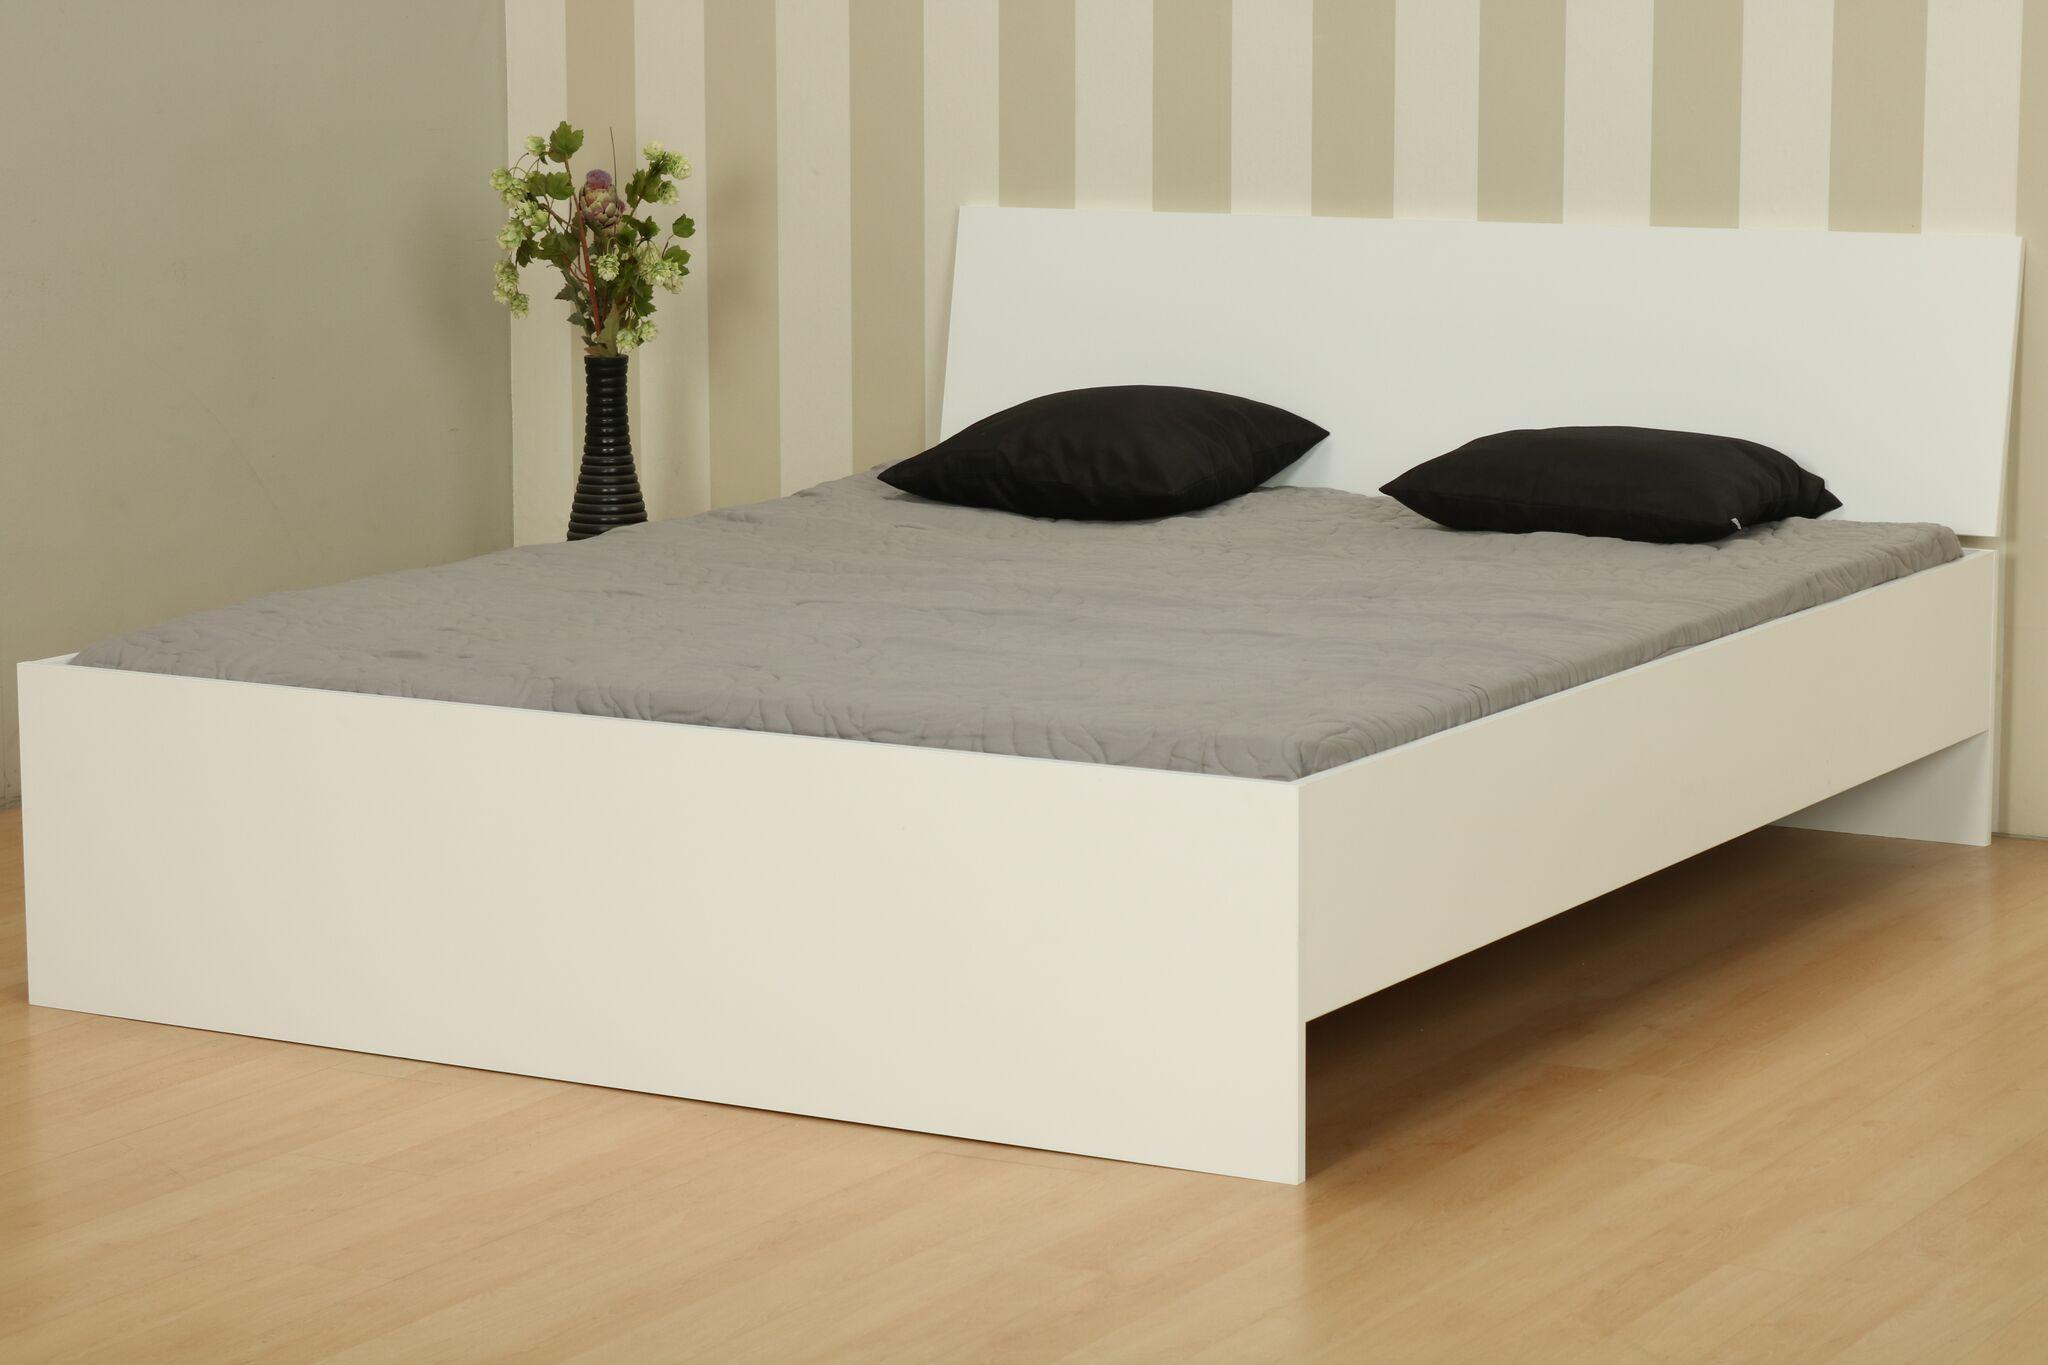 Doppelbett 160x200 Cm Ehebett Holz Bett Bettgestell Bettrahmen Jugendbett Weiß Dynamic 24de